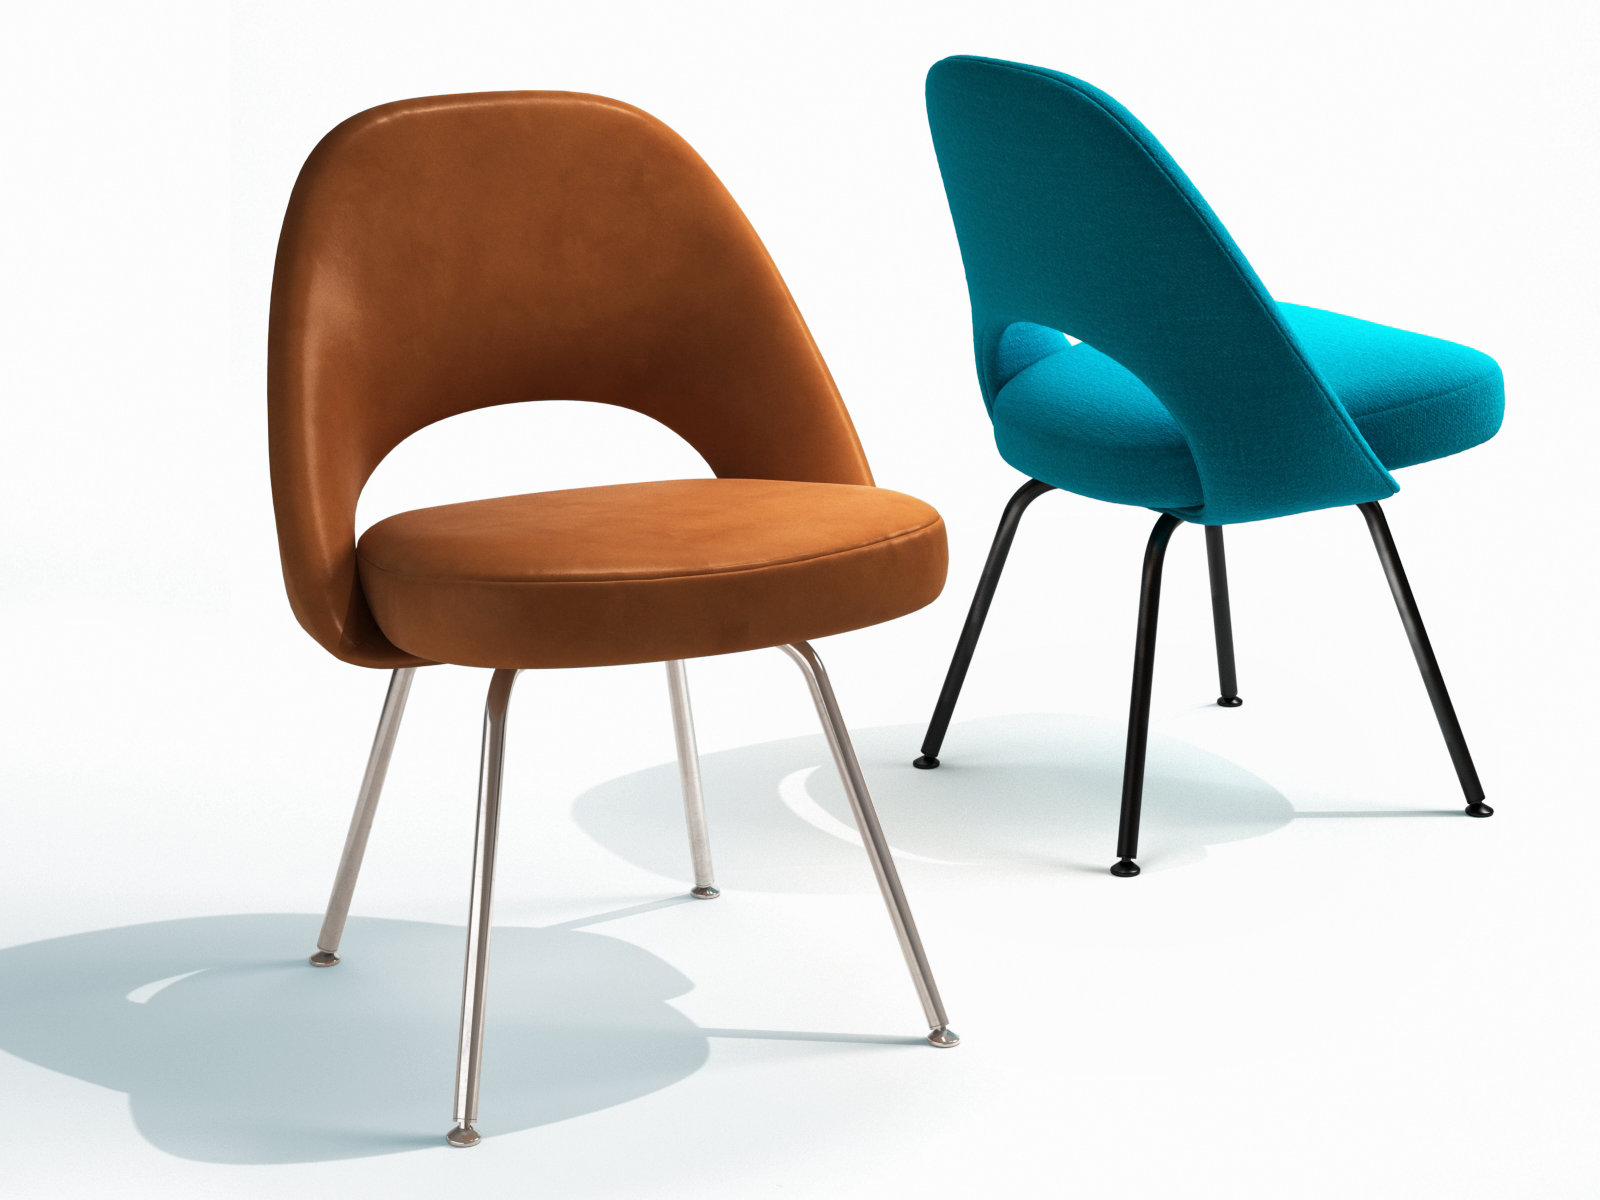 saarinen executive chair steel legs 3d model knoll